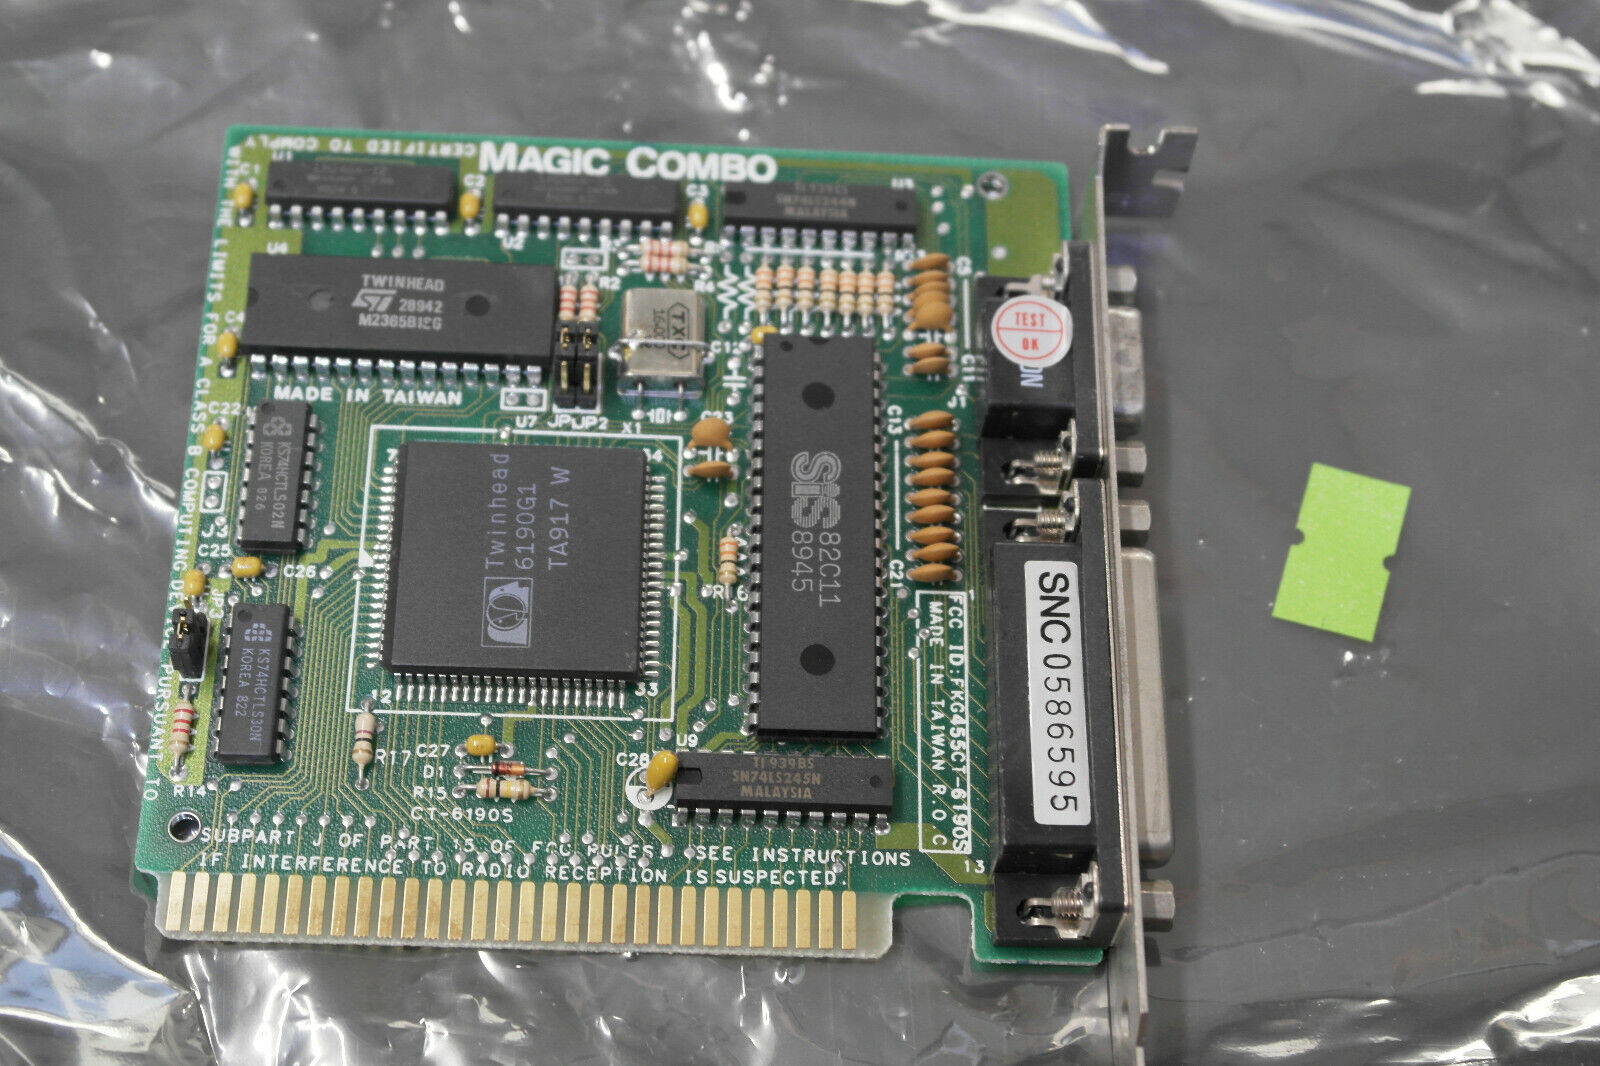 MAGIC COMBO CT-6190S TWINHEAD 6190G1 8 bit ISA HGA DB9 video graphics card